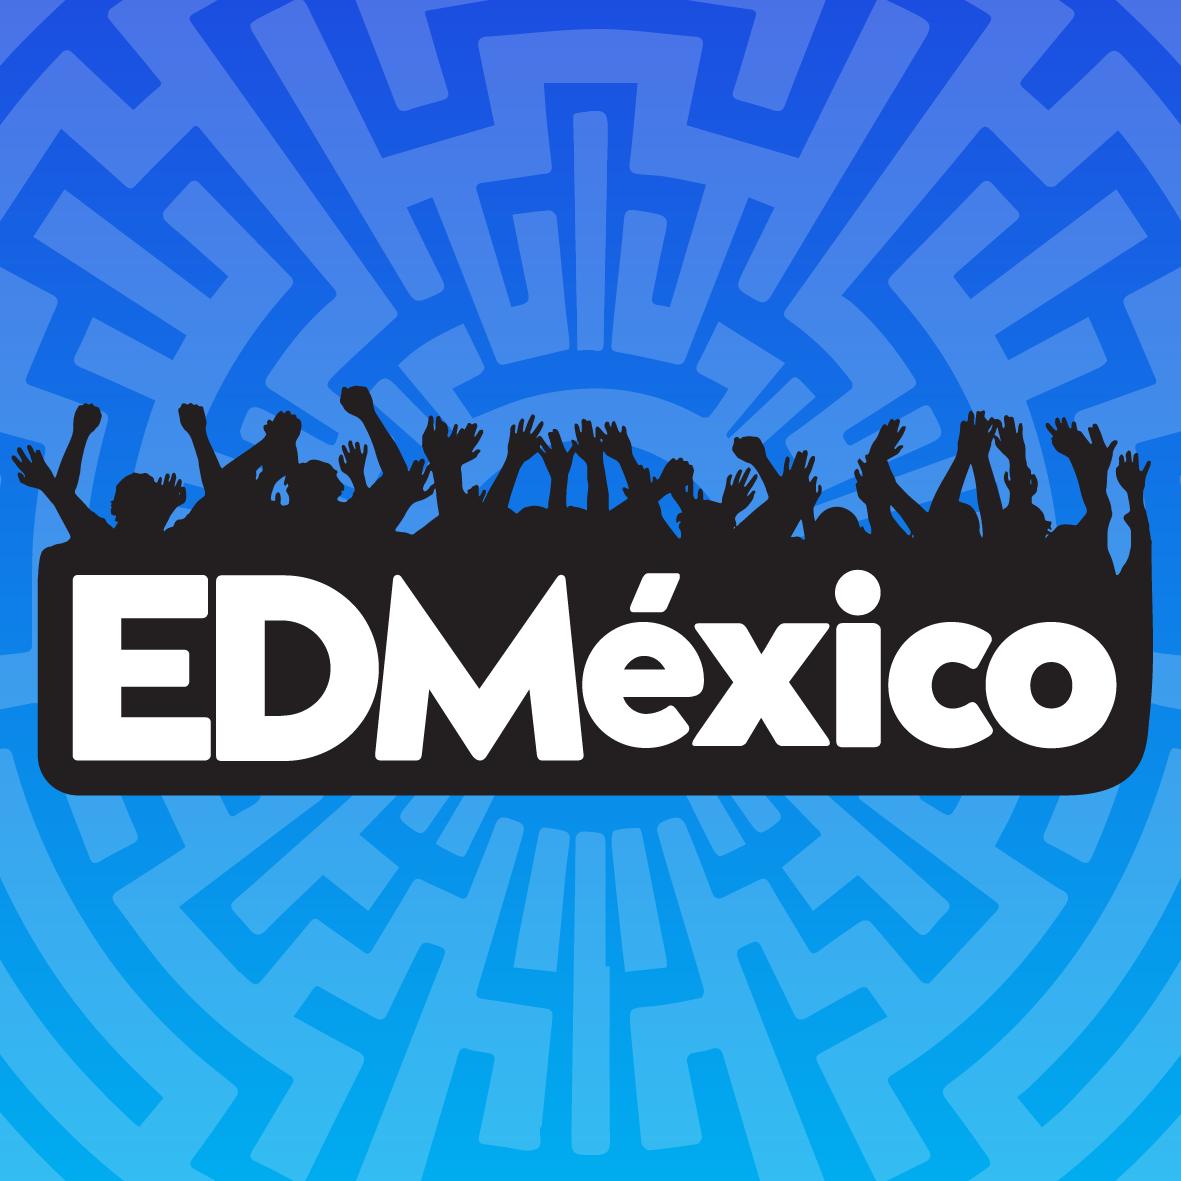 EDMexico-icono-azul-01.png